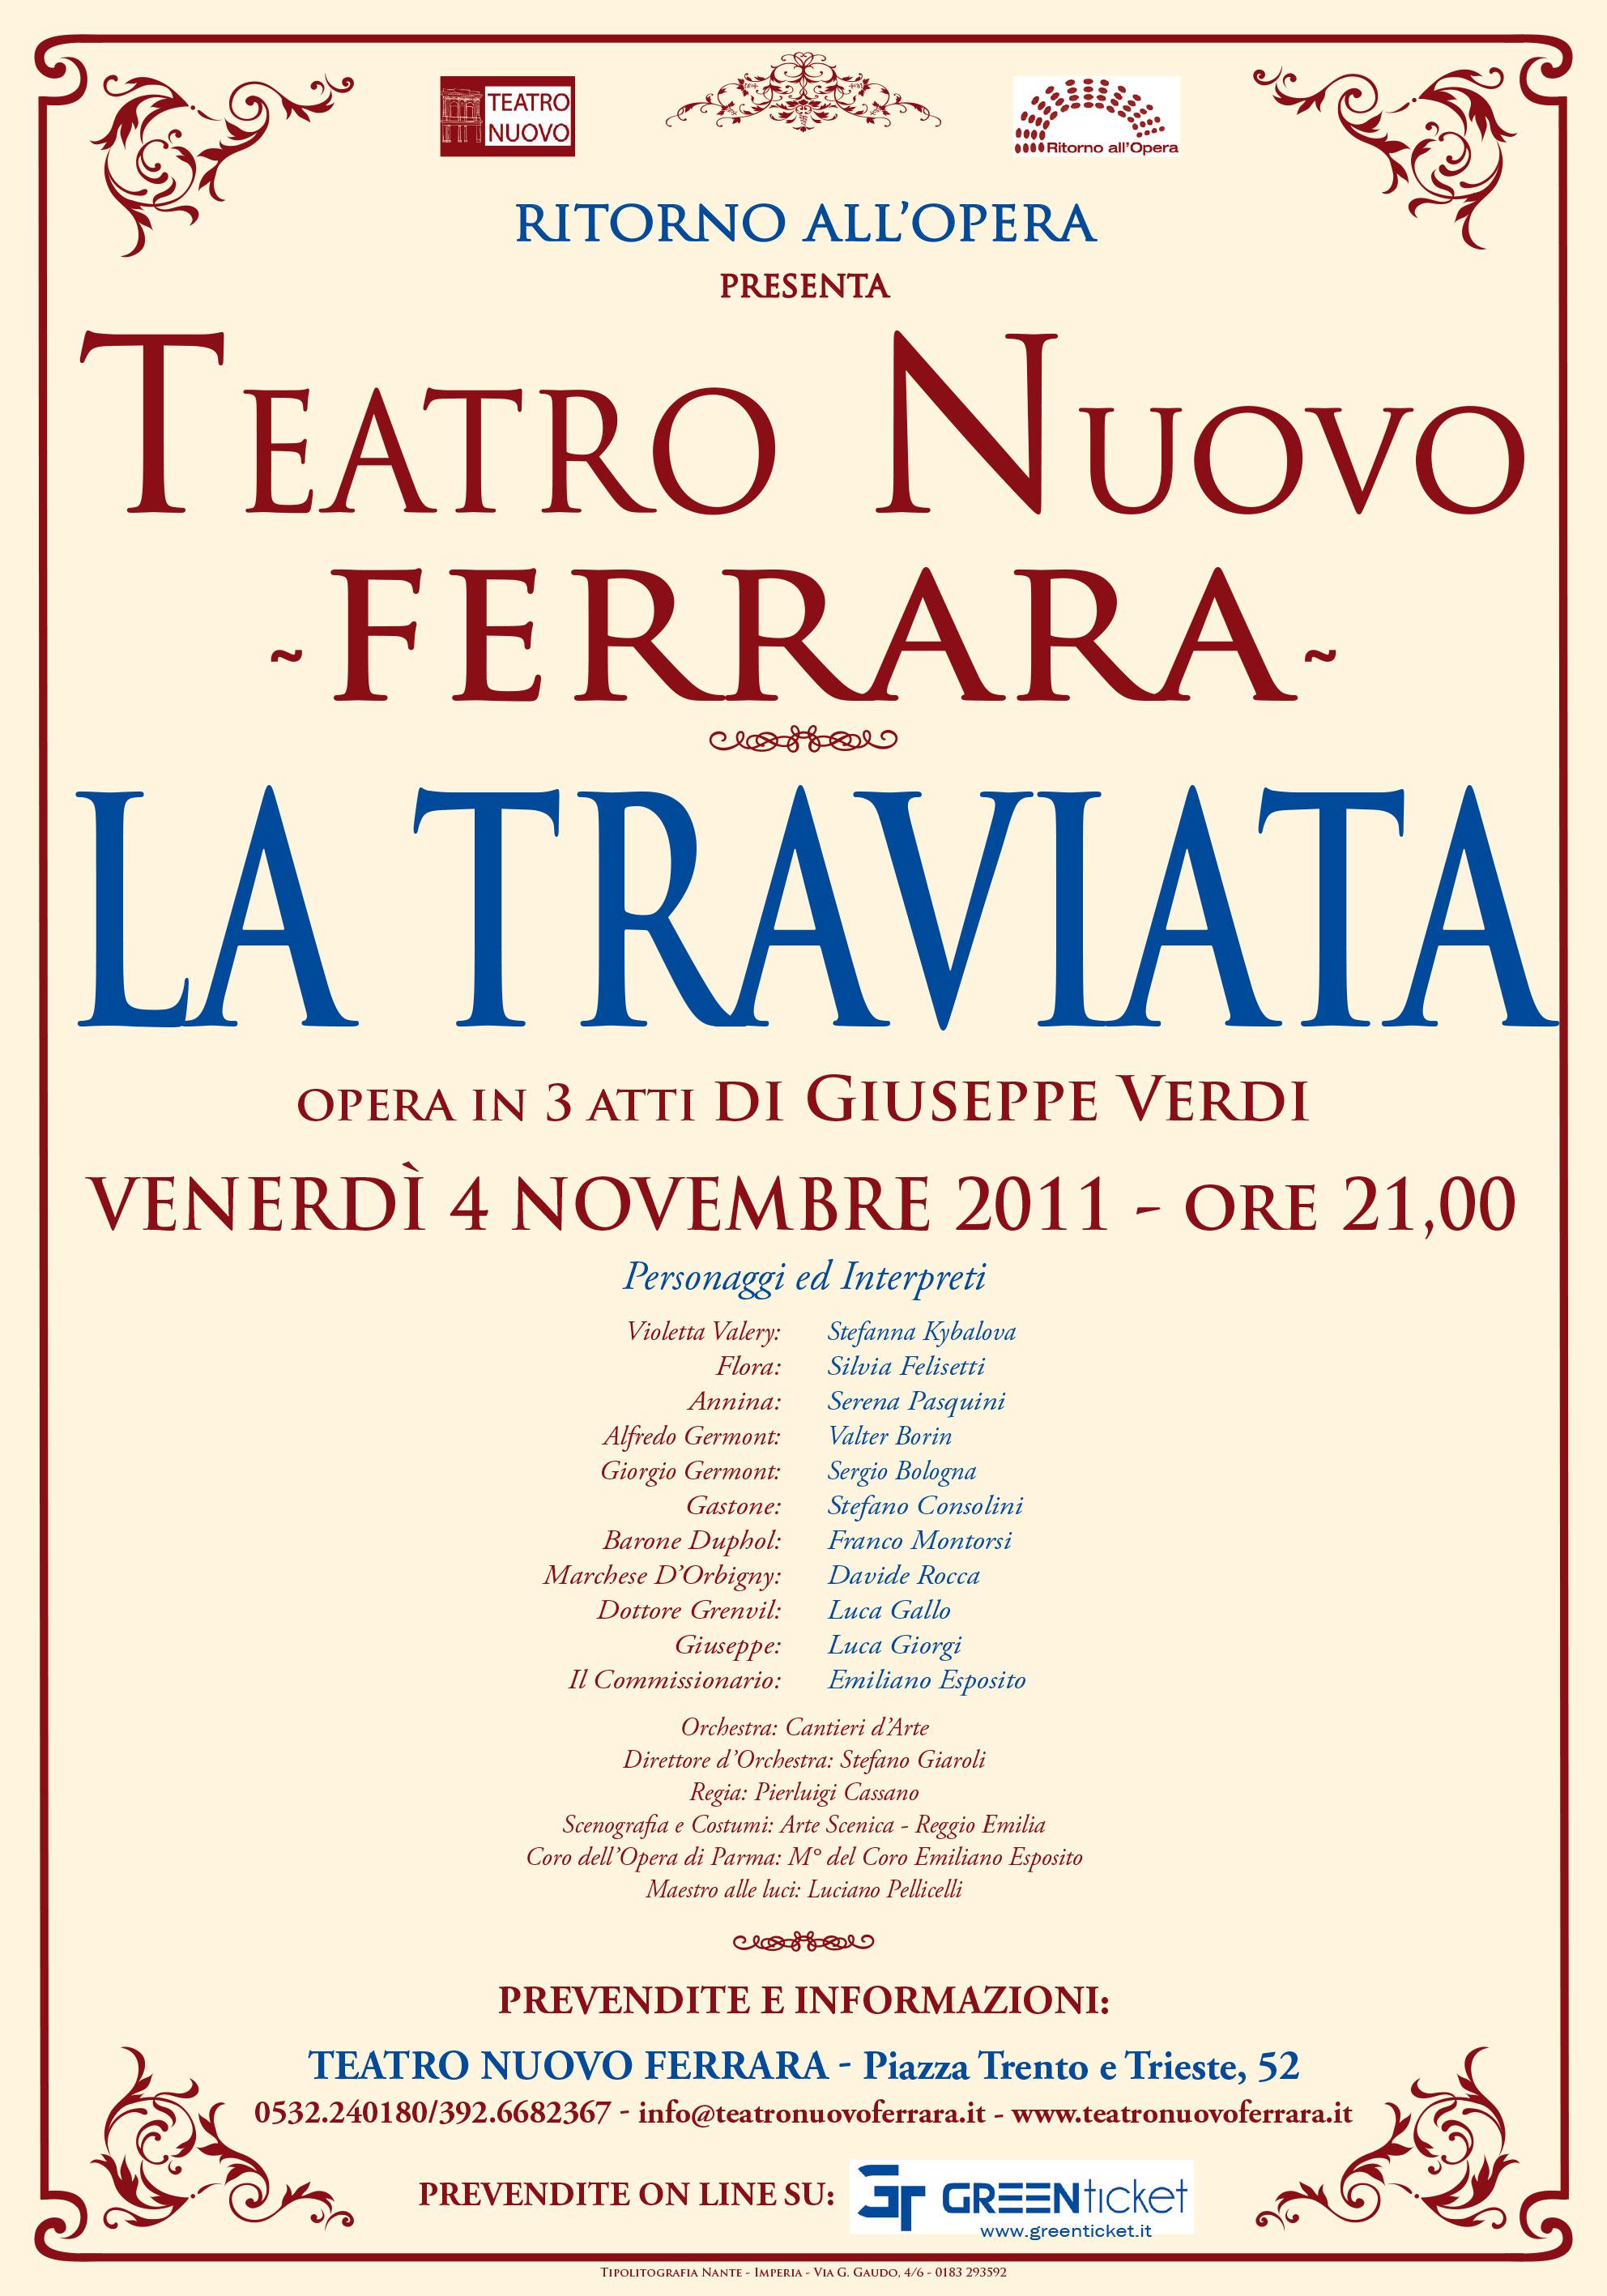 la-traviata-ferrara